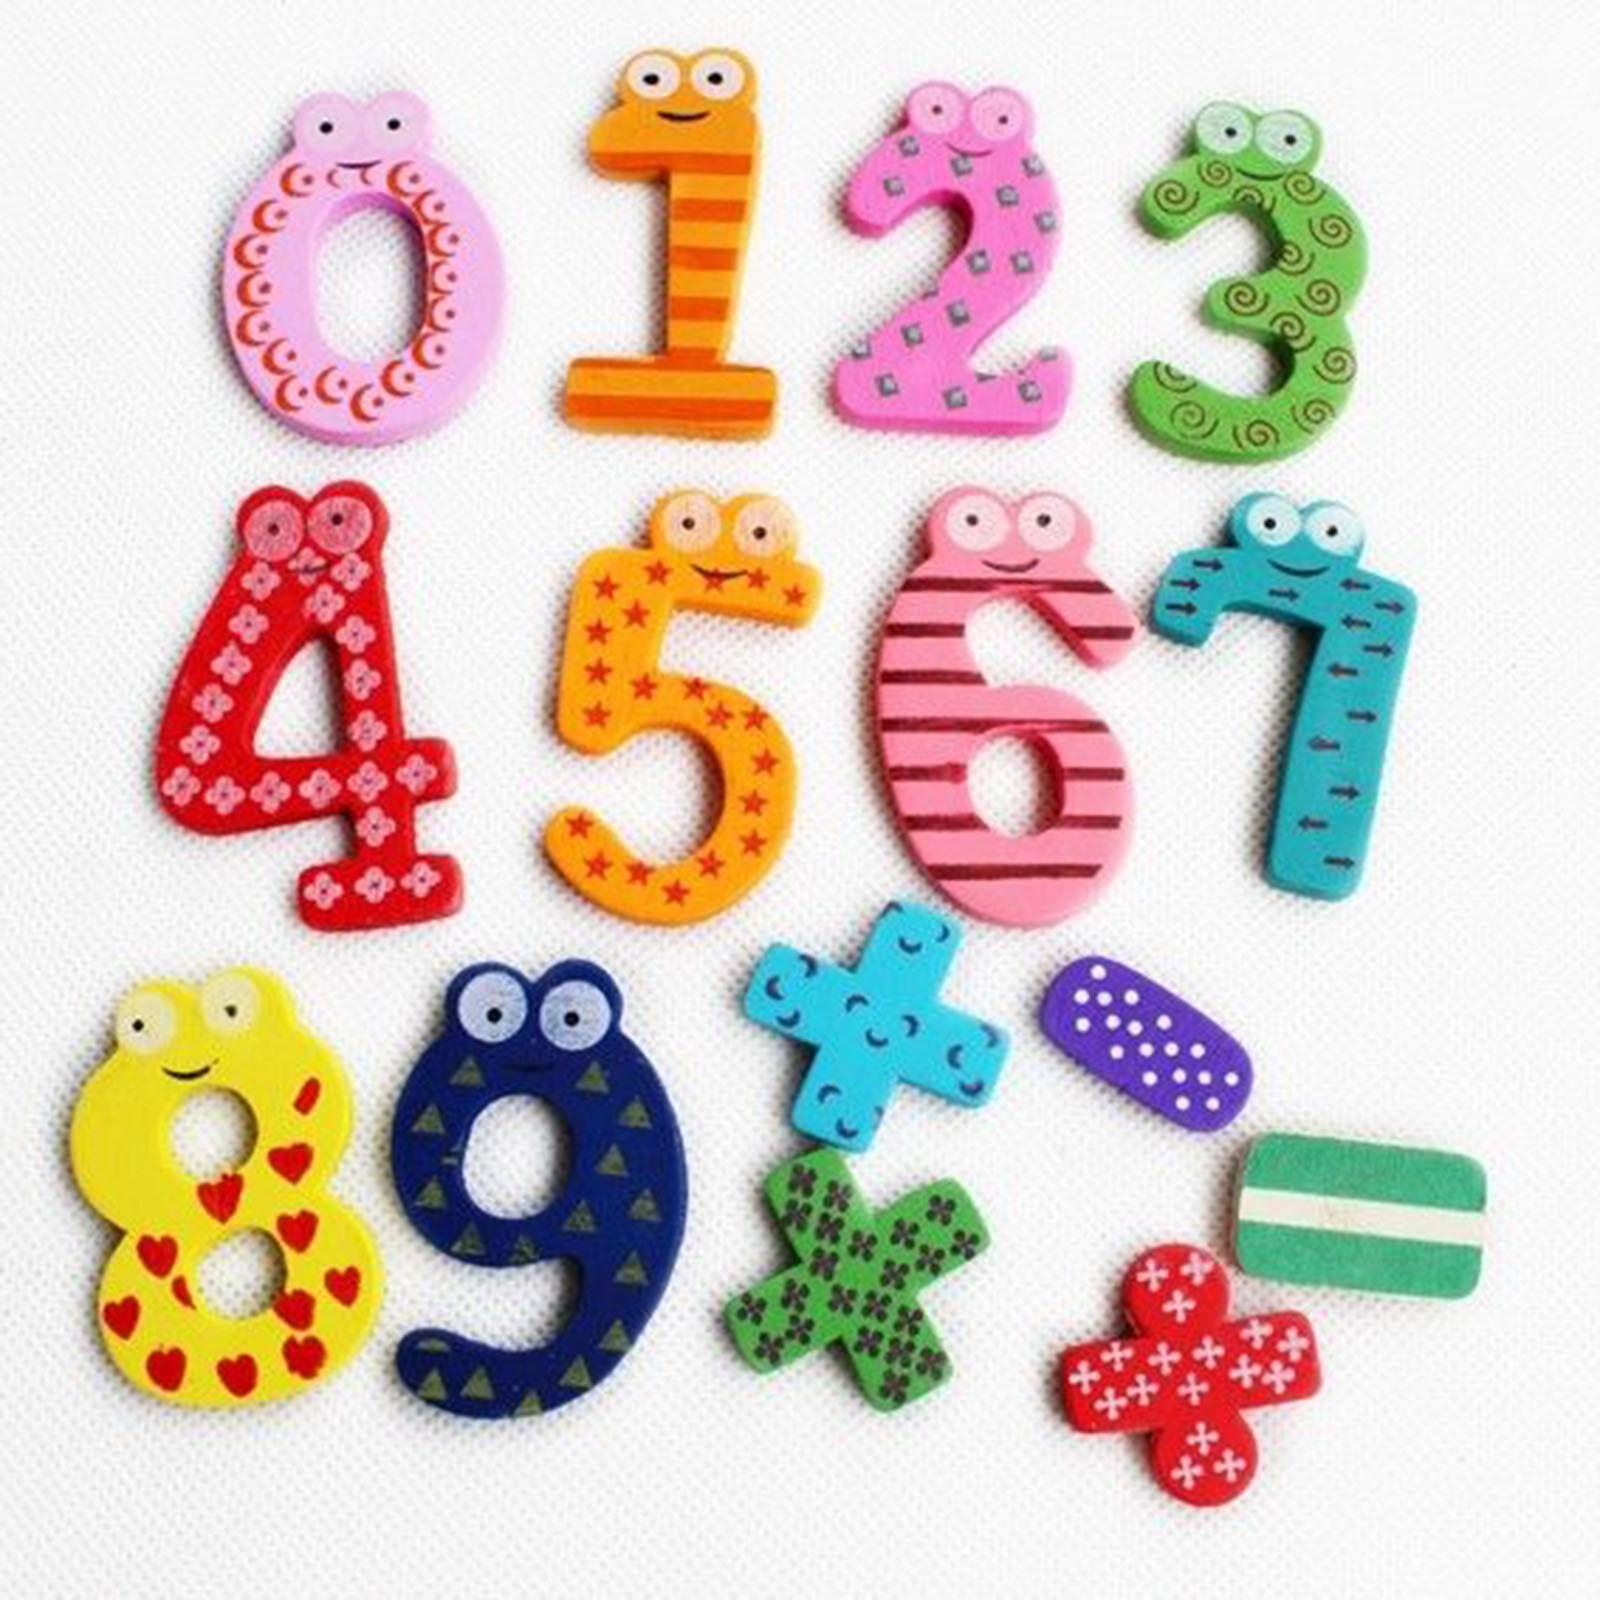 Details about Animation Cartoon animals Wooden Fridge Magnets Kids